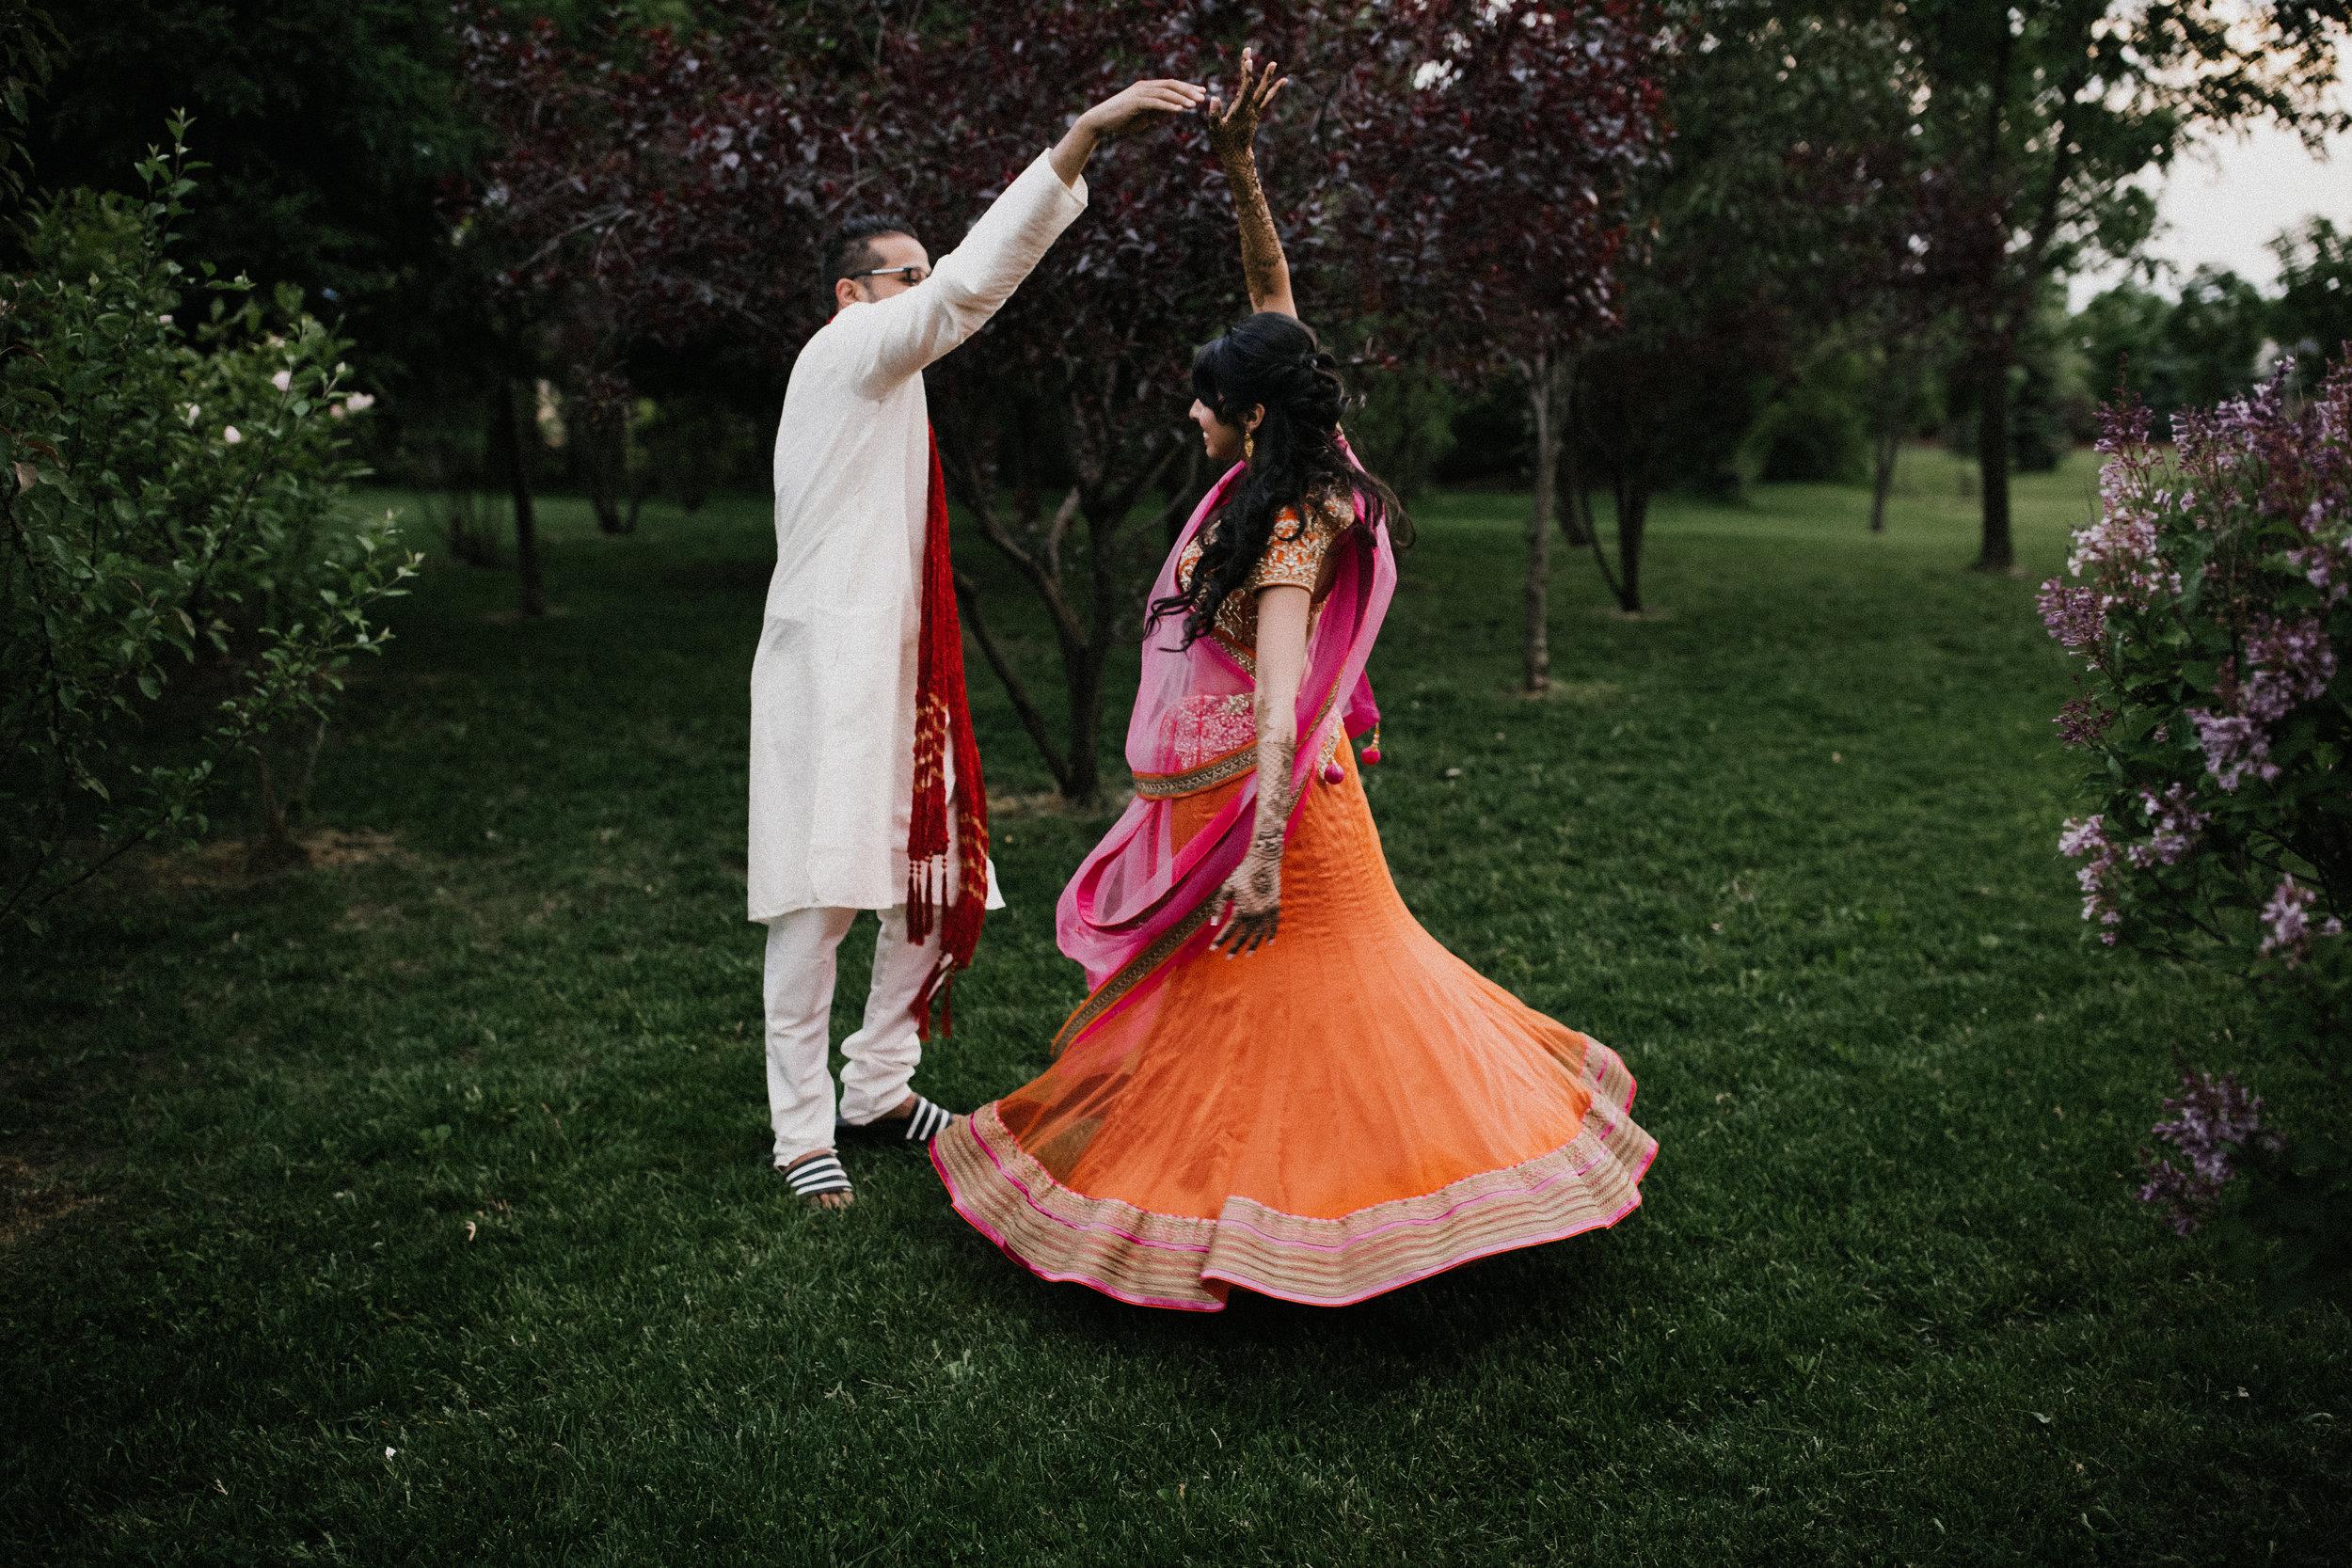 Aparna-Ankit-Patel-Mehndi-Wedding-Photos-0071.jpg